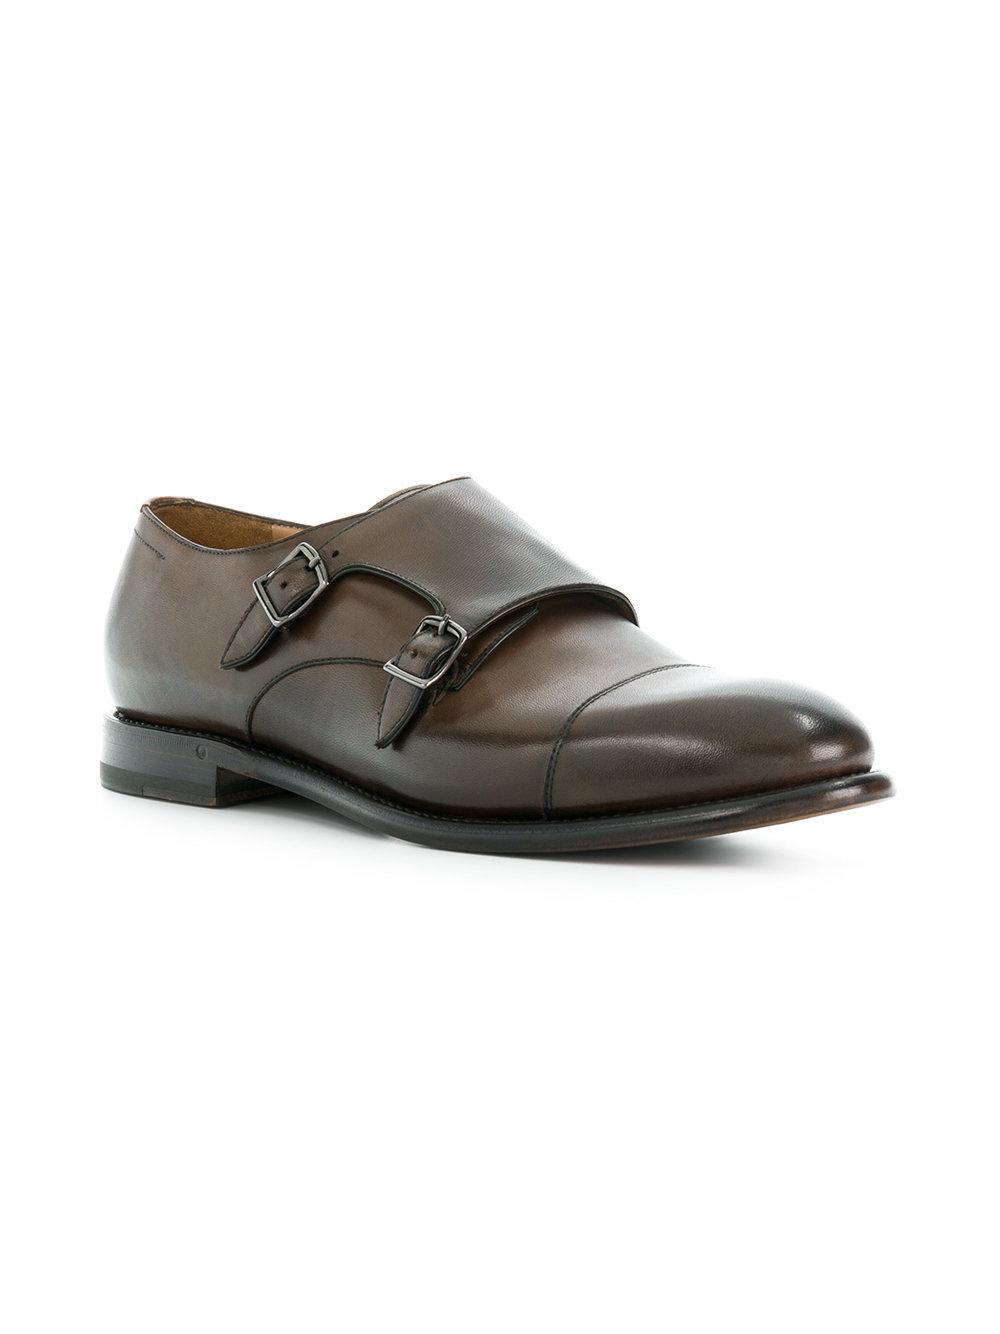 Zapatos con doble hebilla de cuero en marrón oscuro de Silvano Sassetti